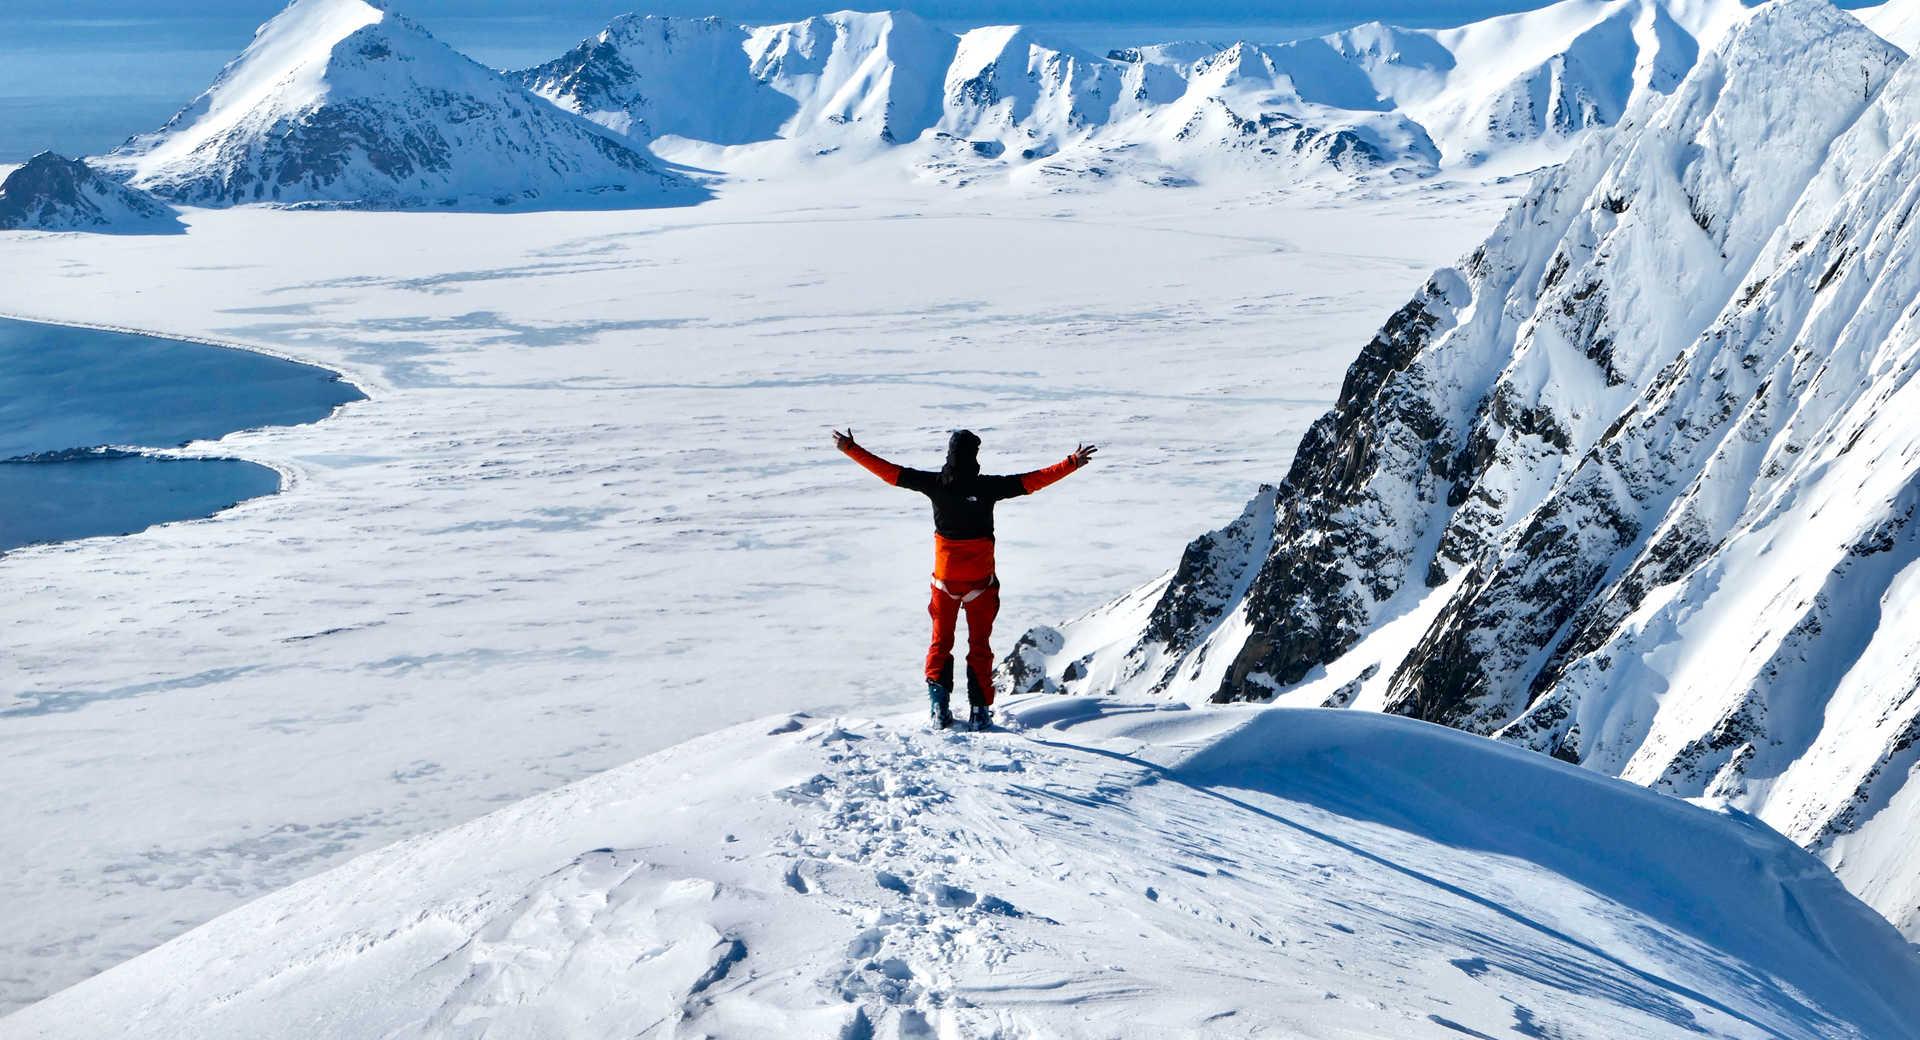 Au sommet des montagnes du Svalbard, hiver